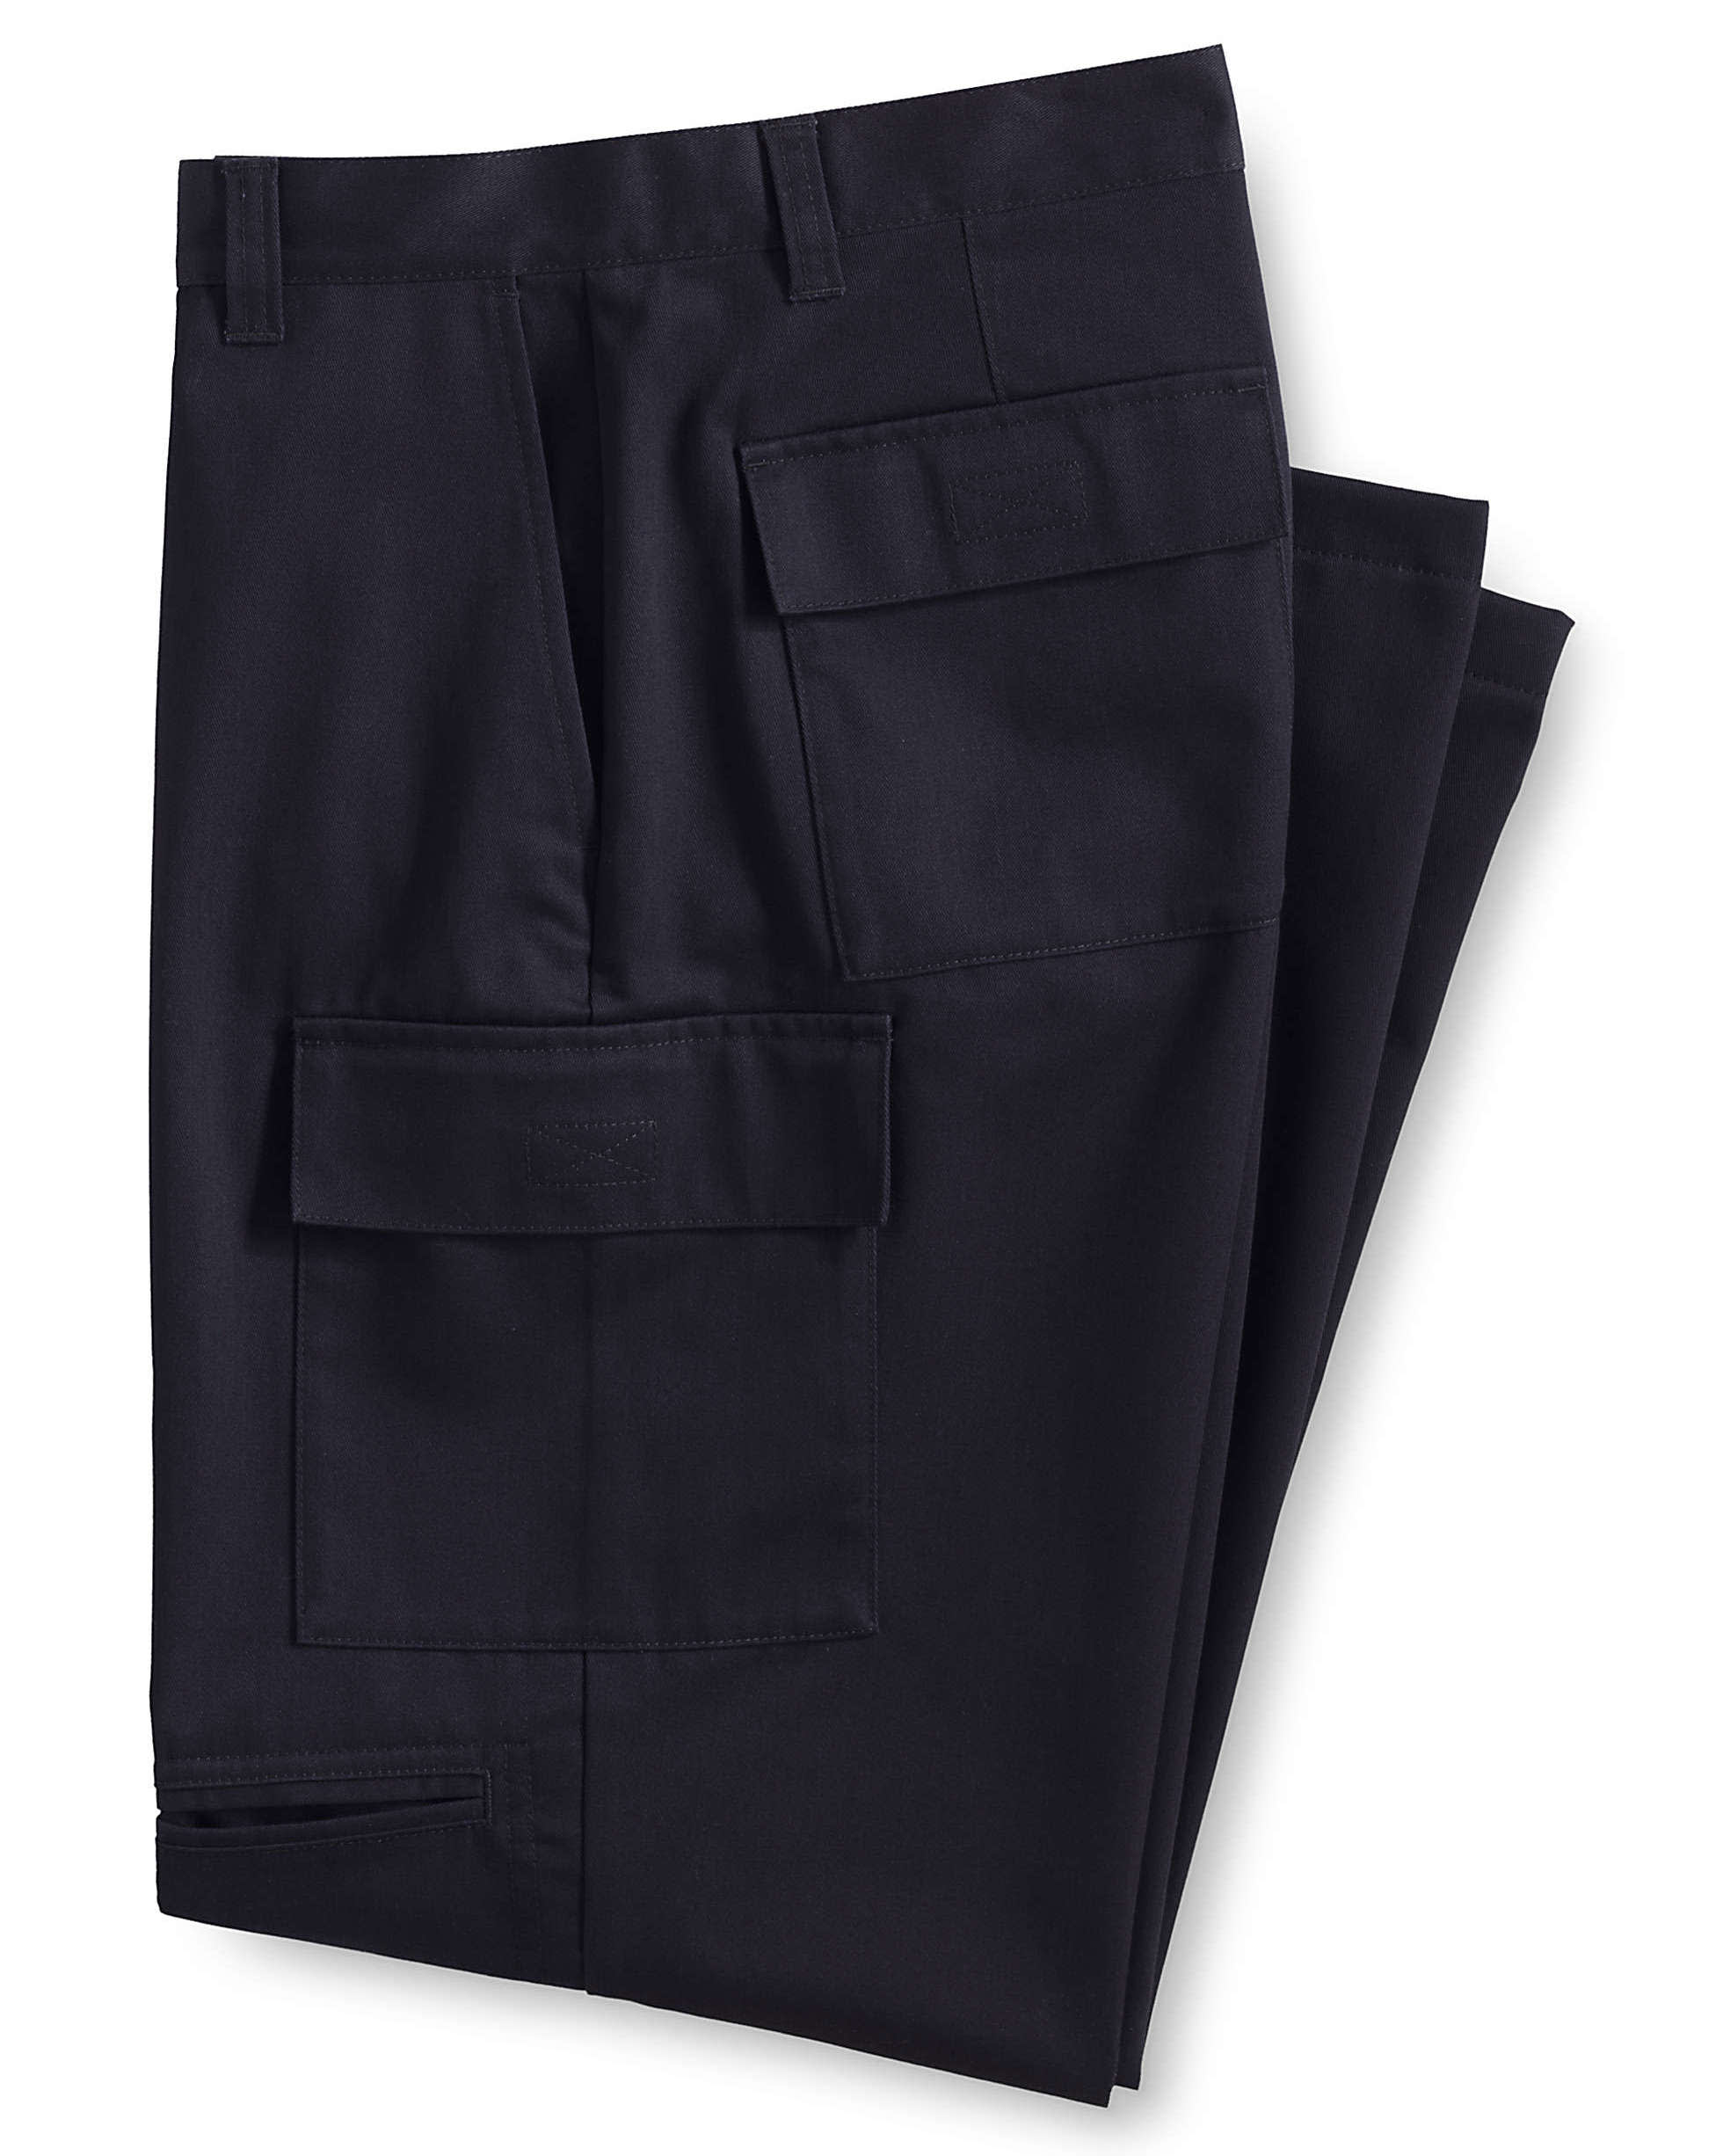 Lands' End Men's Knee Pad Cargo Pants